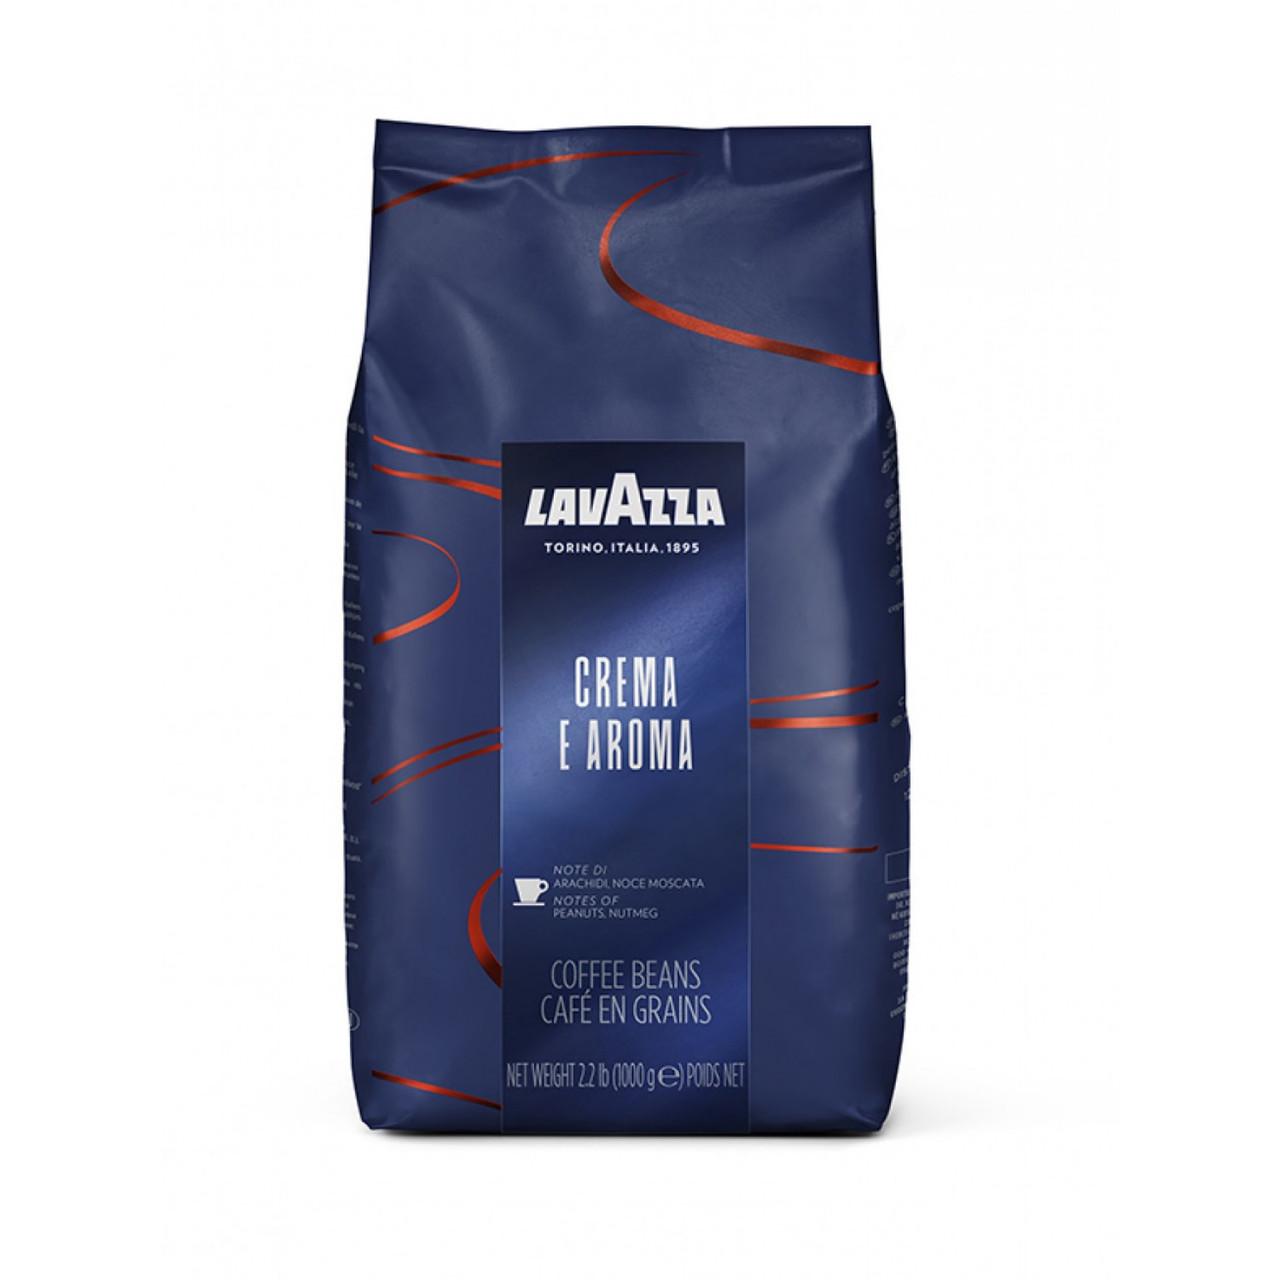 Кофе зерно Lavazza Crema e Aroma Espresso (синяя) , Италия, 1 кг(ОРИГИНАЛ)